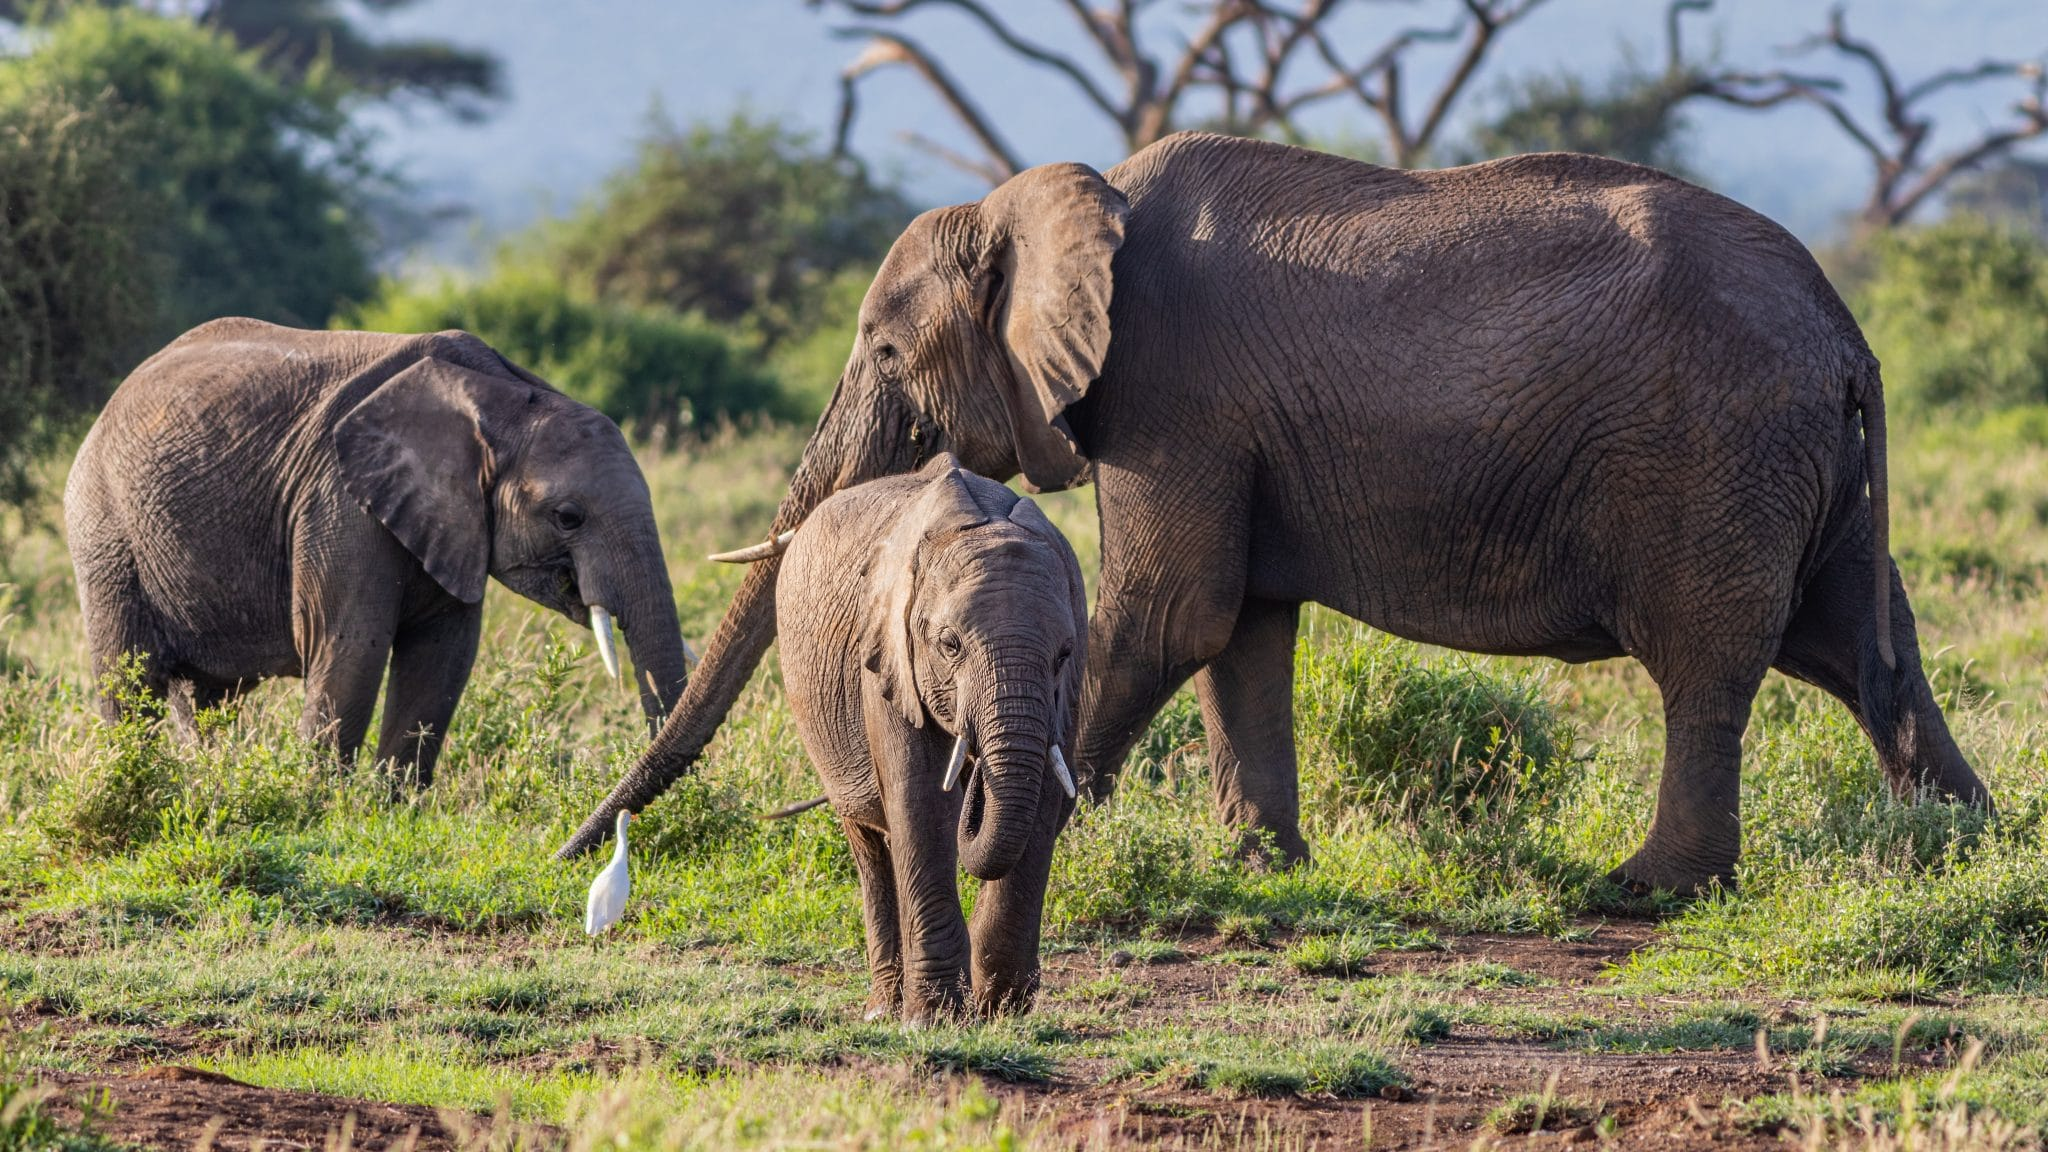 Elephants Population